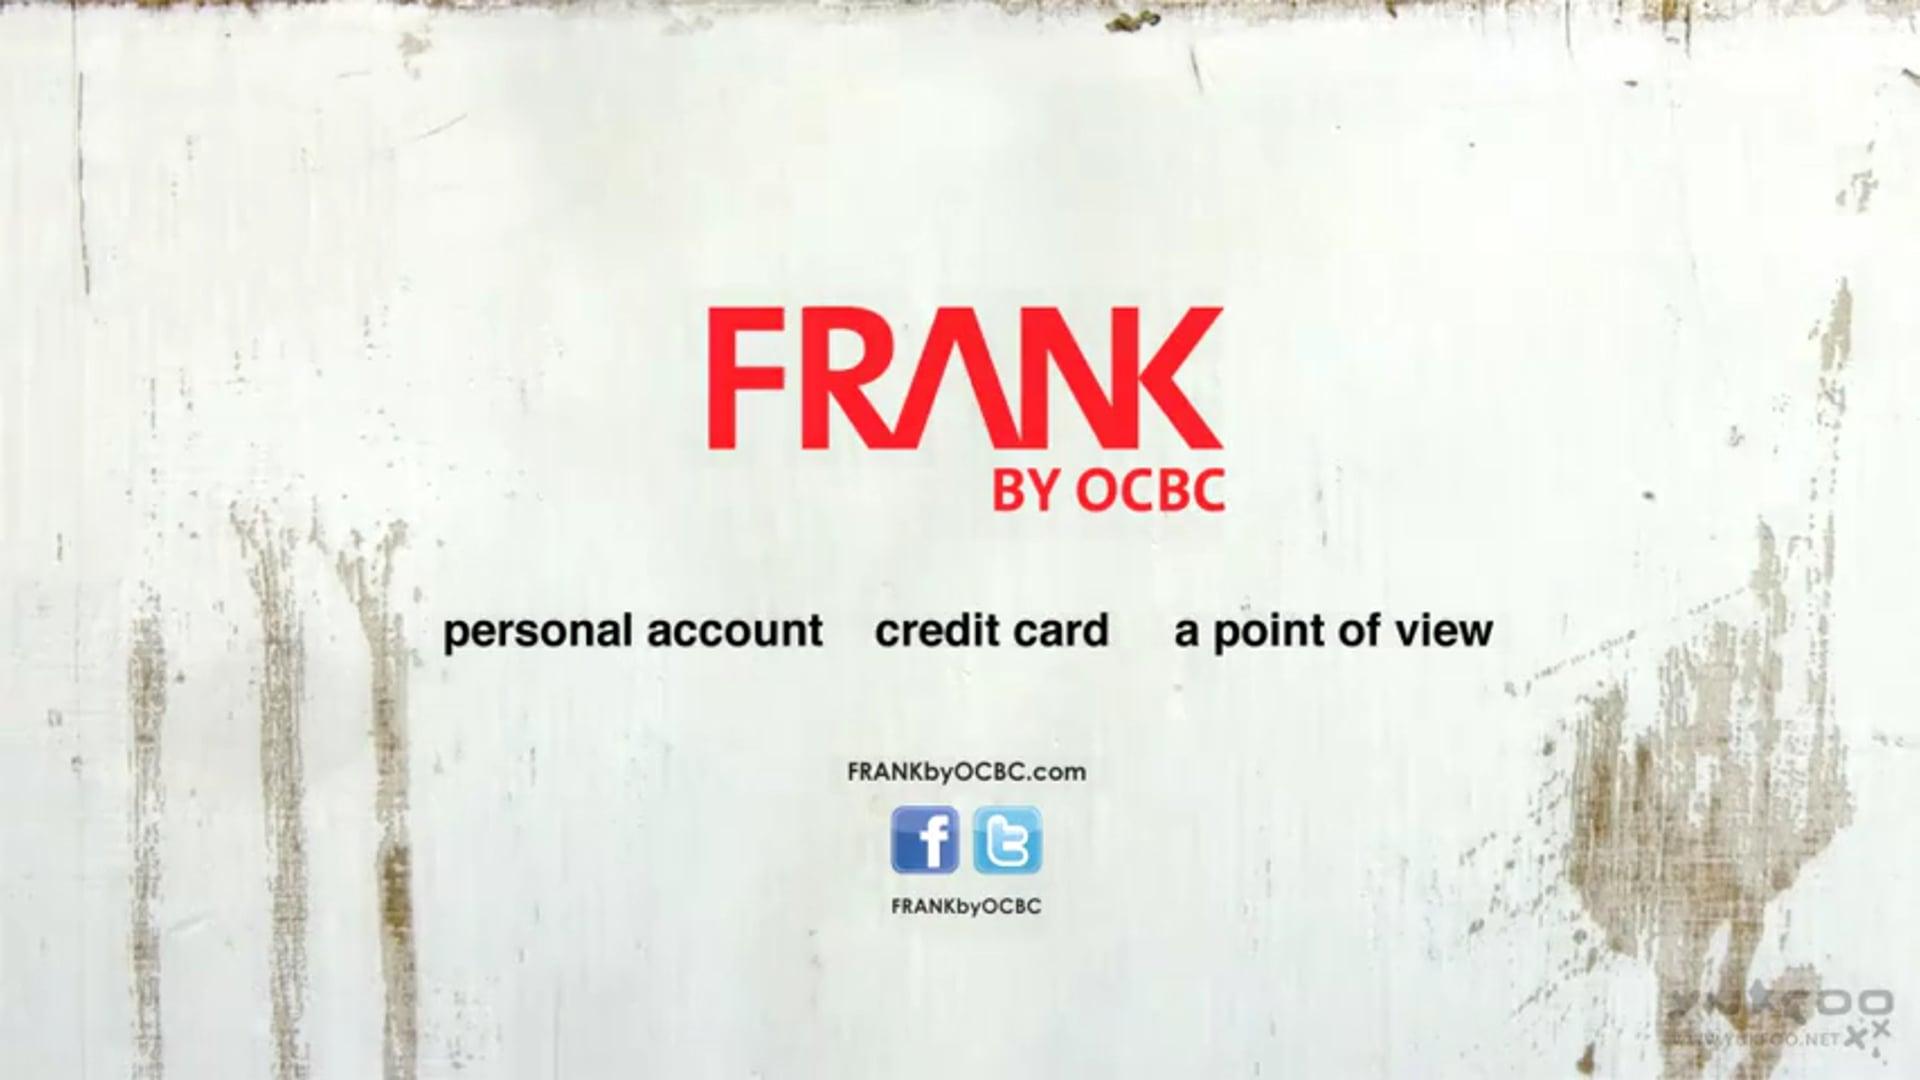 OCBC - FRANK by OCBC Campaign